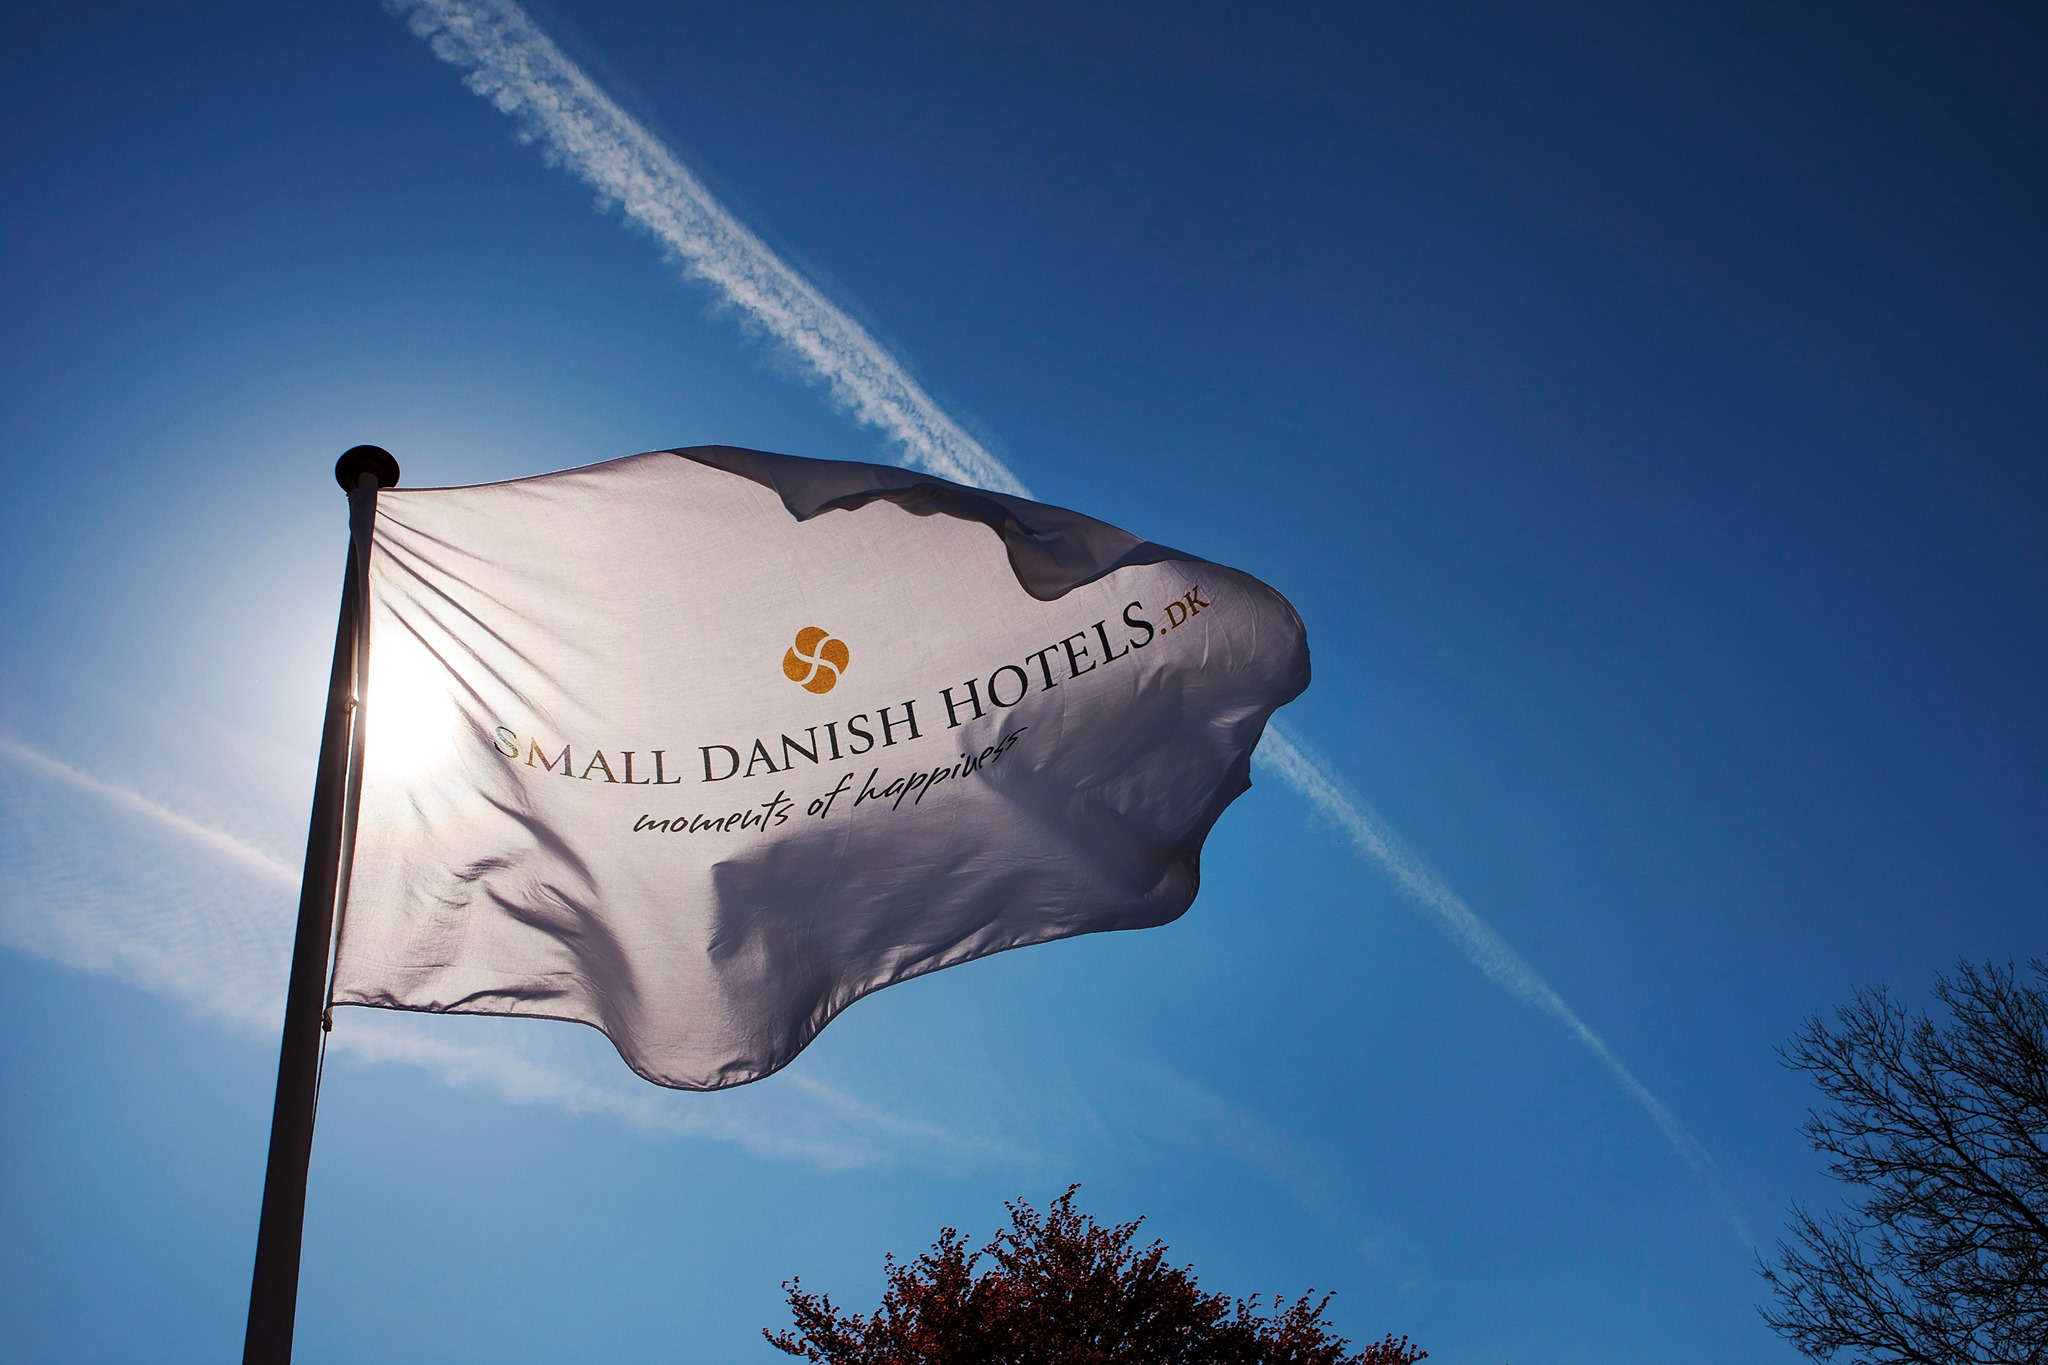 (Arkivfoto: Small Danish Hotels | Facebook)